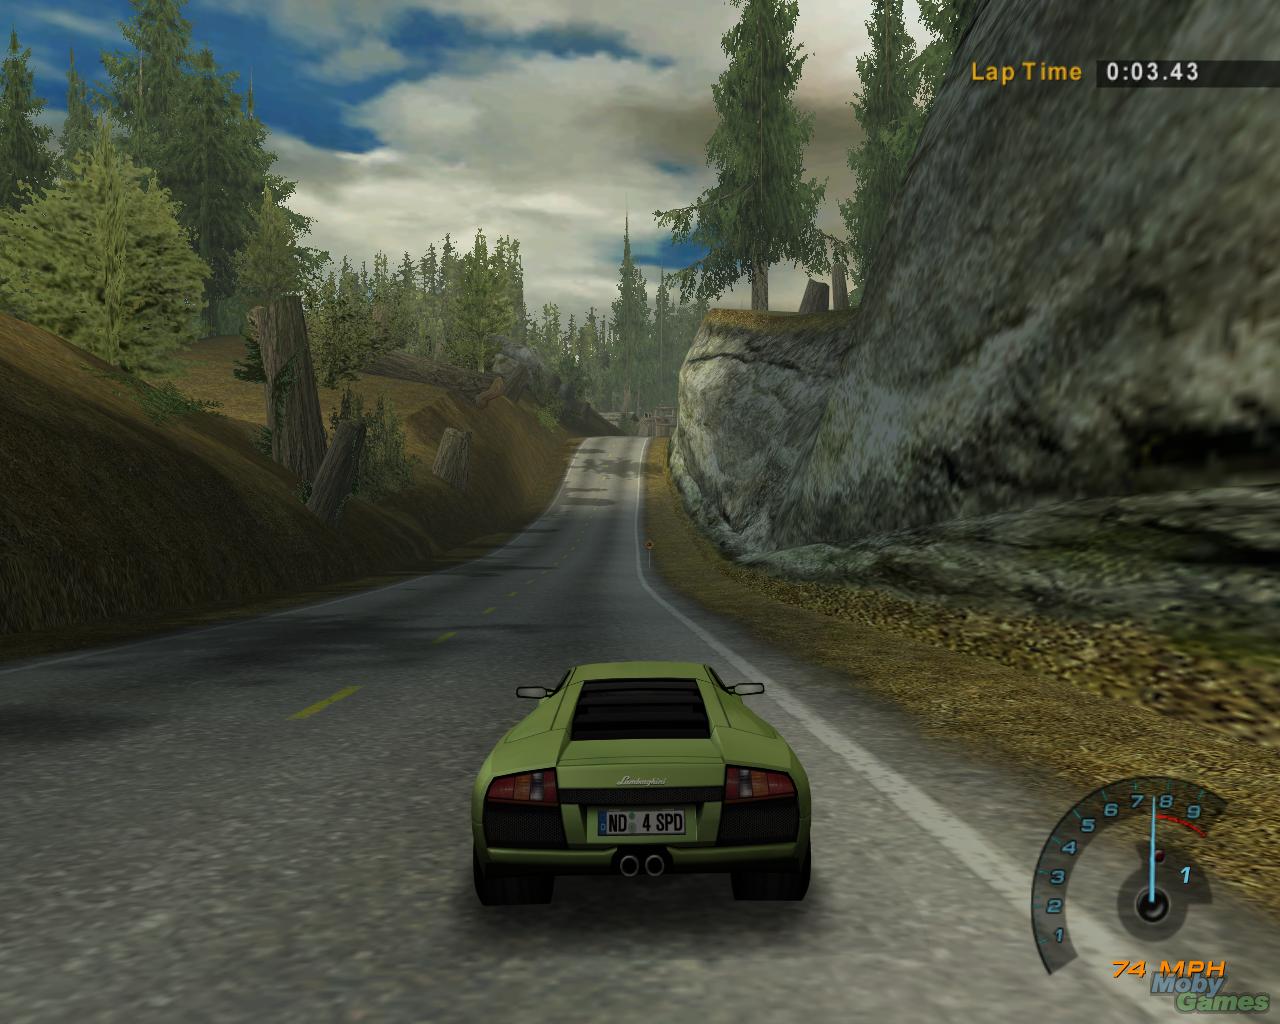 http://www.pcgameshardware.de/screenshots/original/2012/06/225629-need-for-speed-hot-pursuit-2-windows-screenshot-one-of-the.png